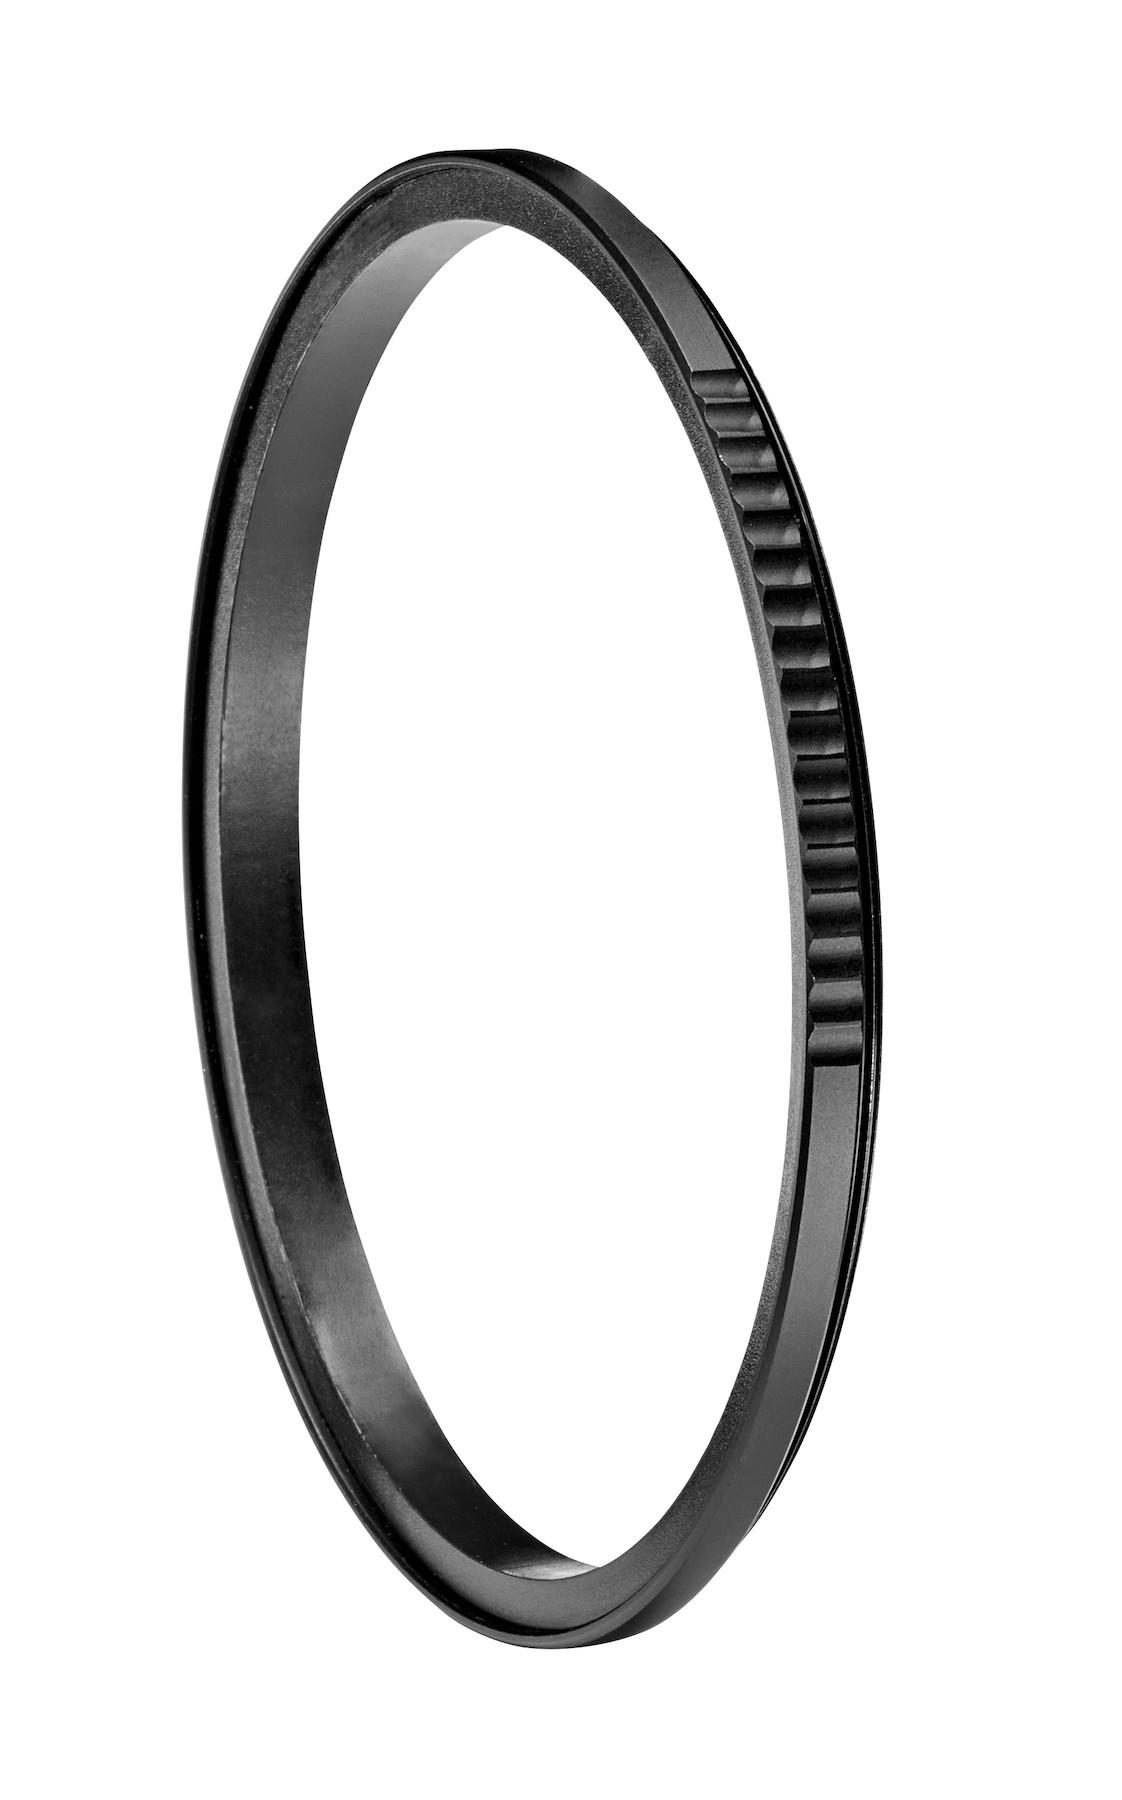 58 mm Xume Lens Adapter